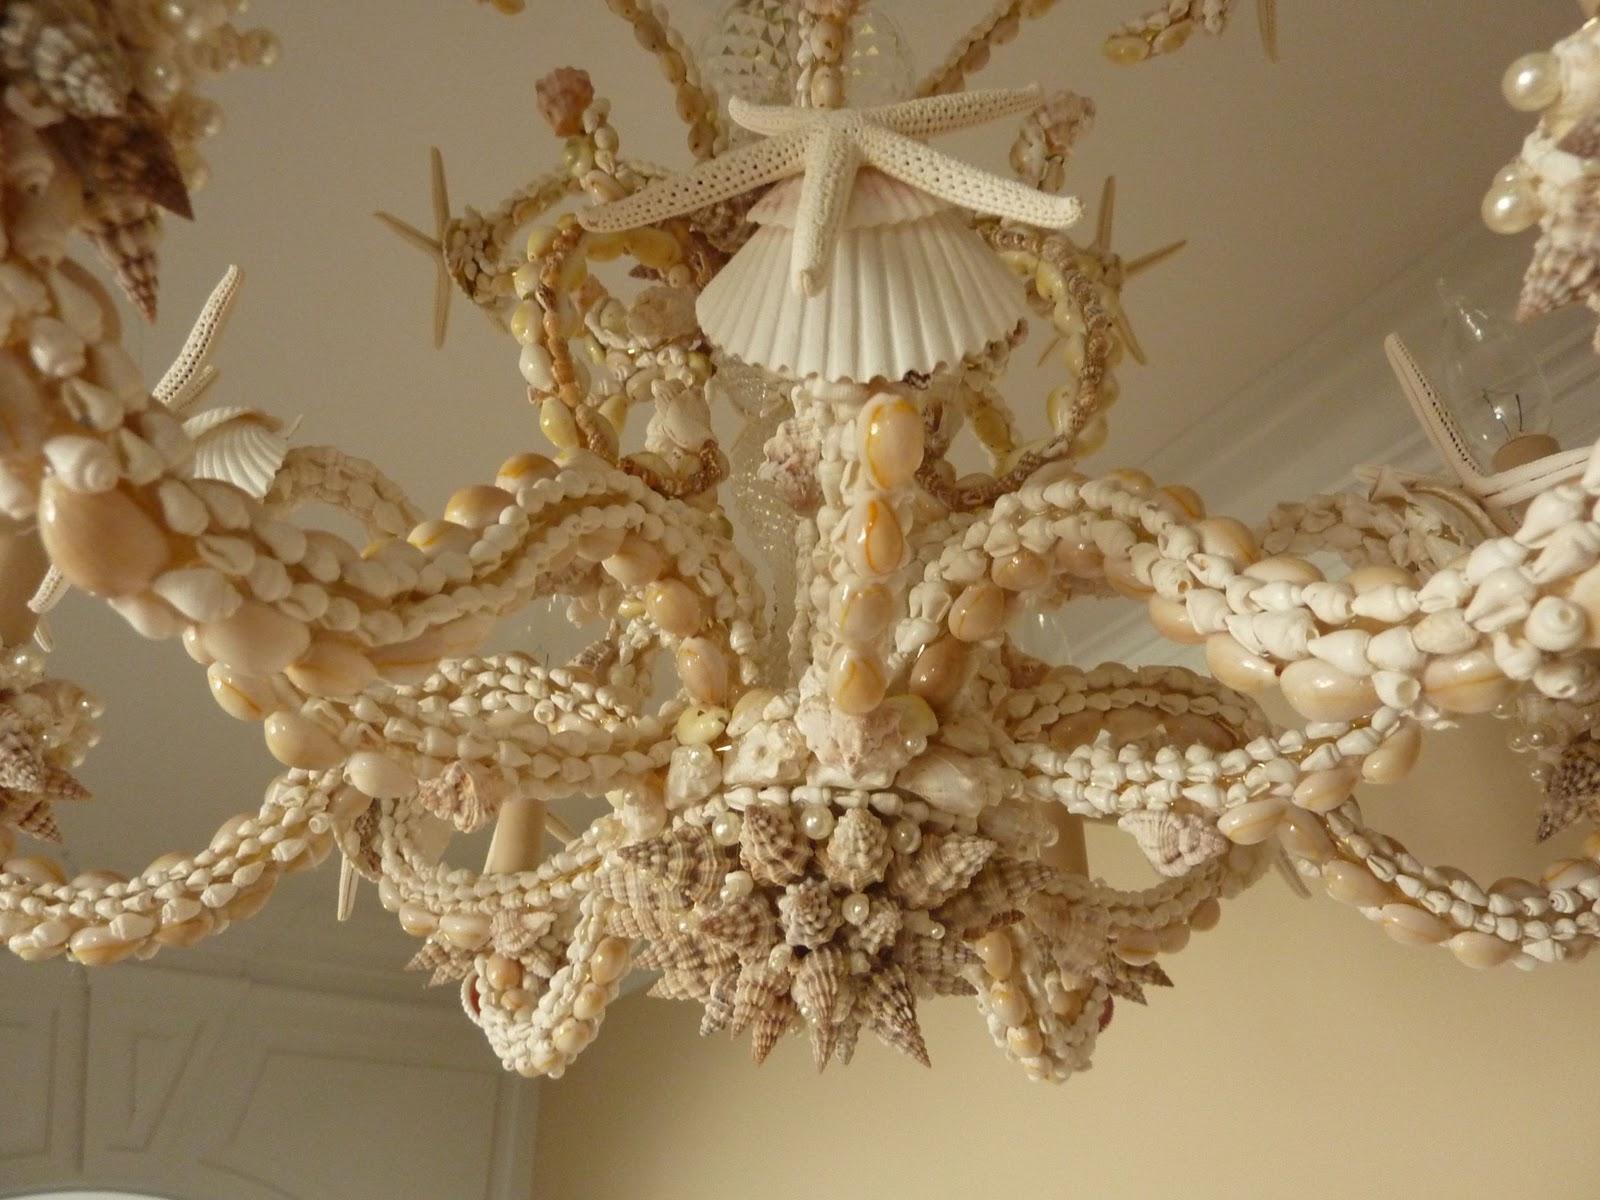 bliss cozy seashell chandelier chandeliers shell chandeleir